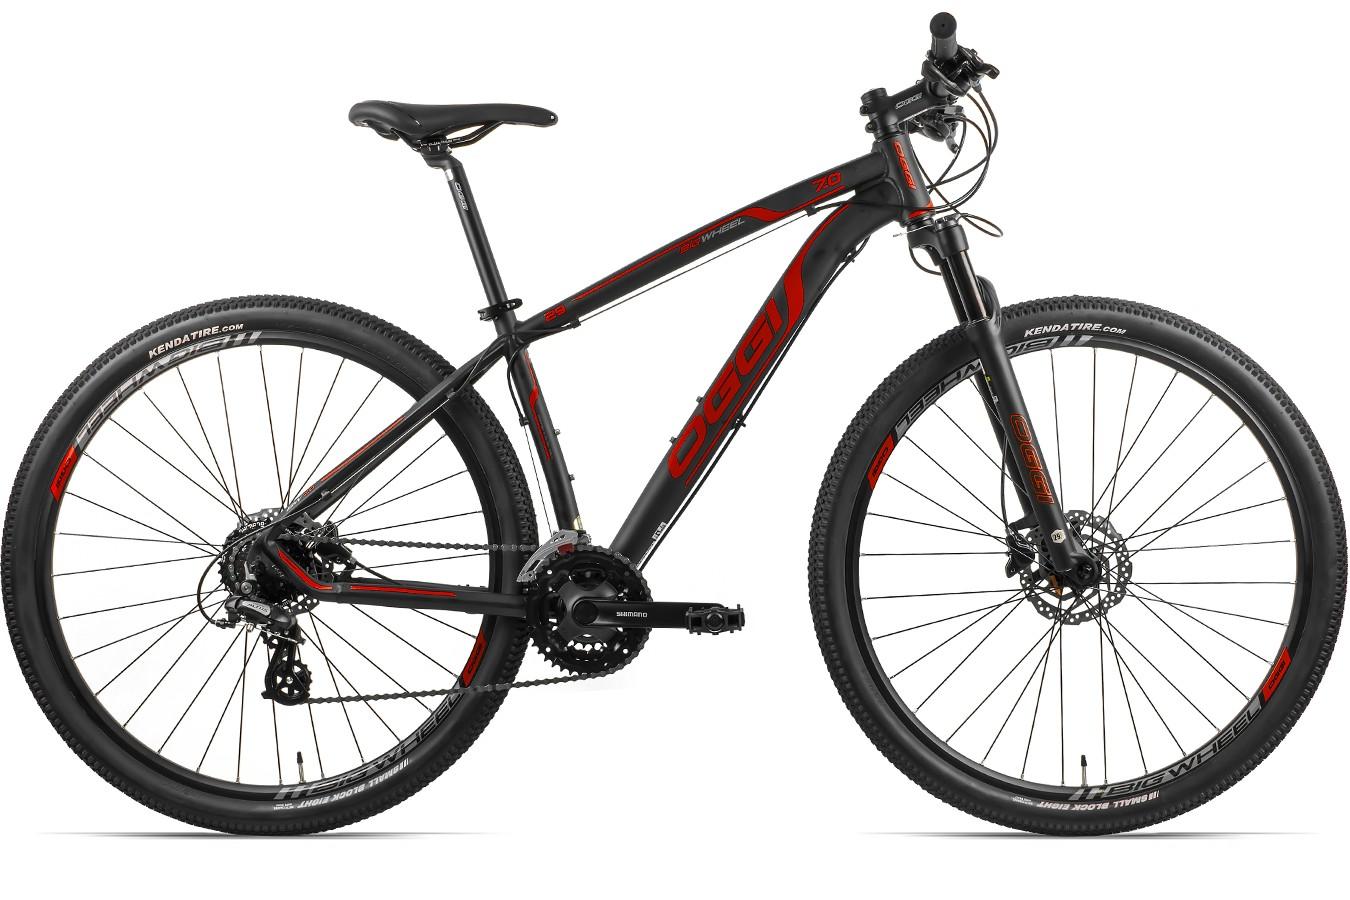 Bicicleta 29 BW 7.0 2017 24v Freio Hidráulico - Oggi